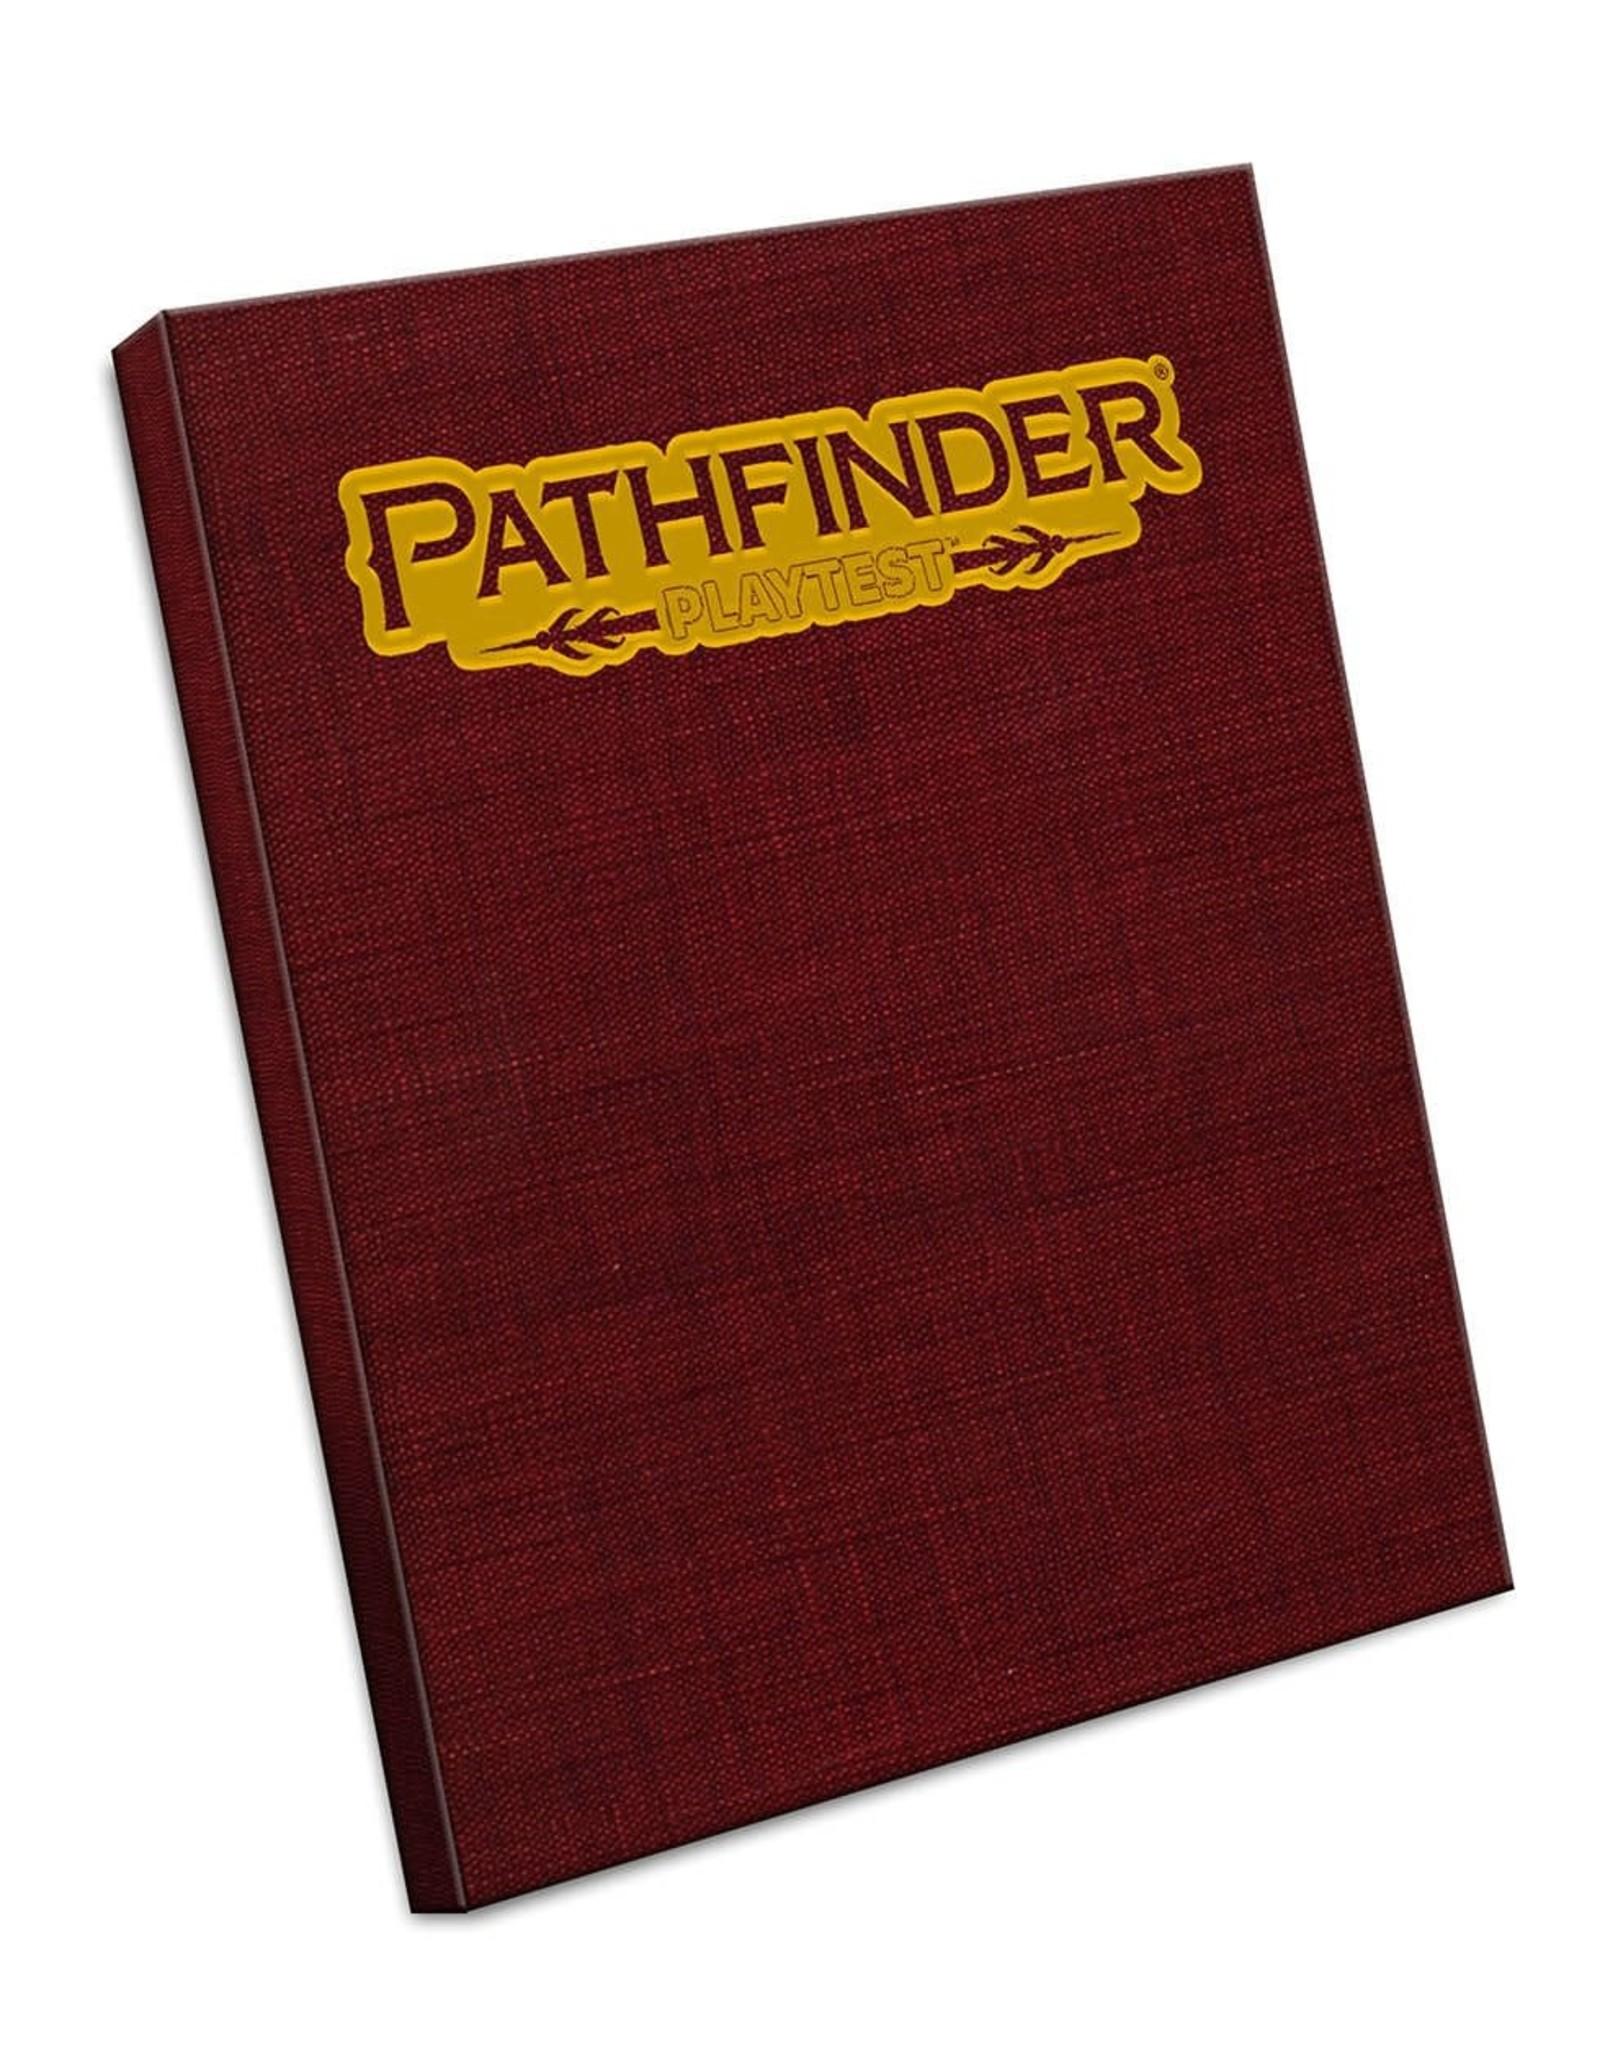 Pathfinder Playtest Collector's Edition